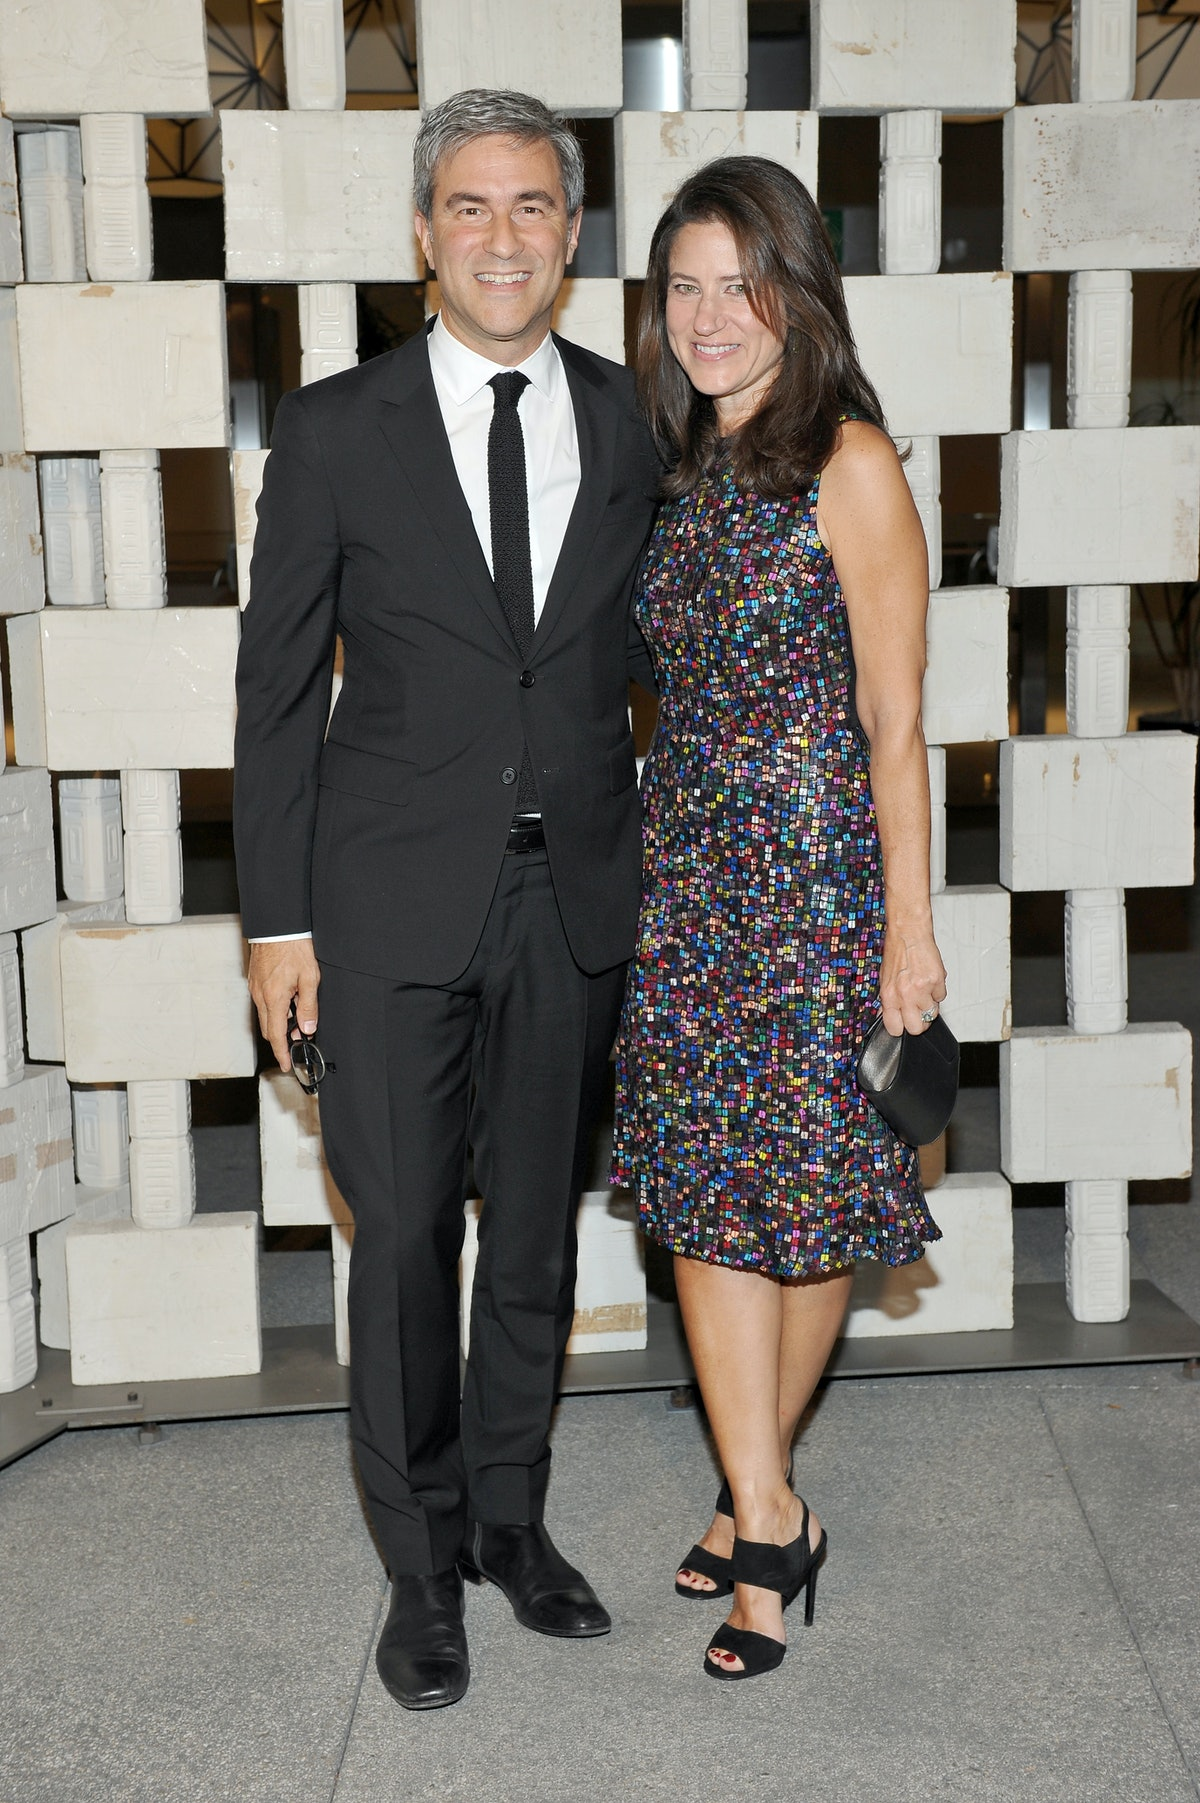 Michael Govan and Katherine Ross